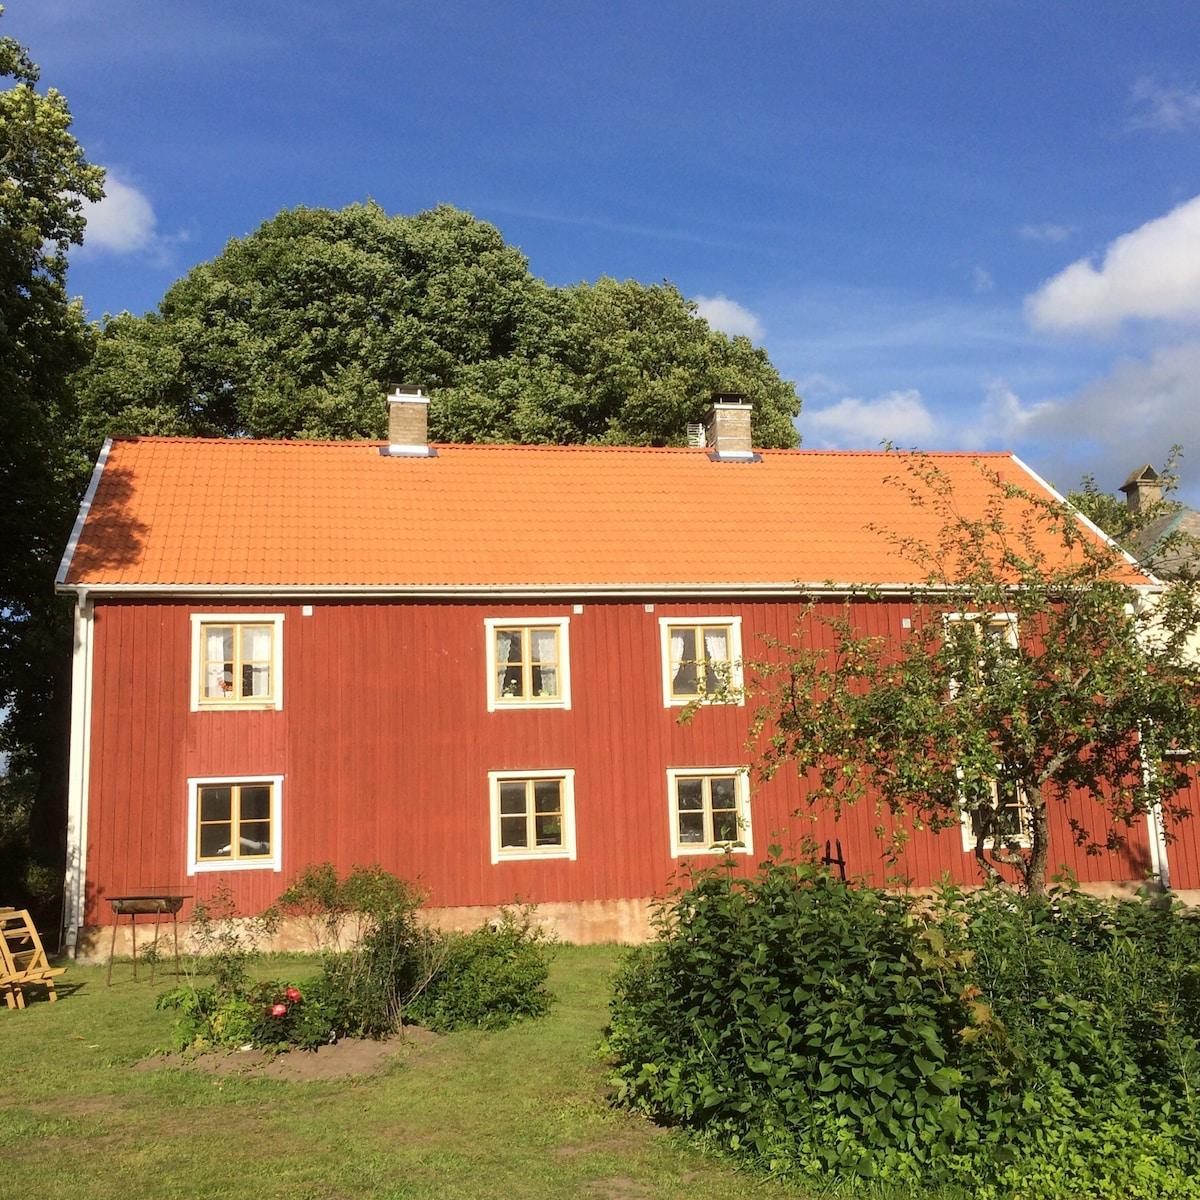 bra massage göteborg linköping spa